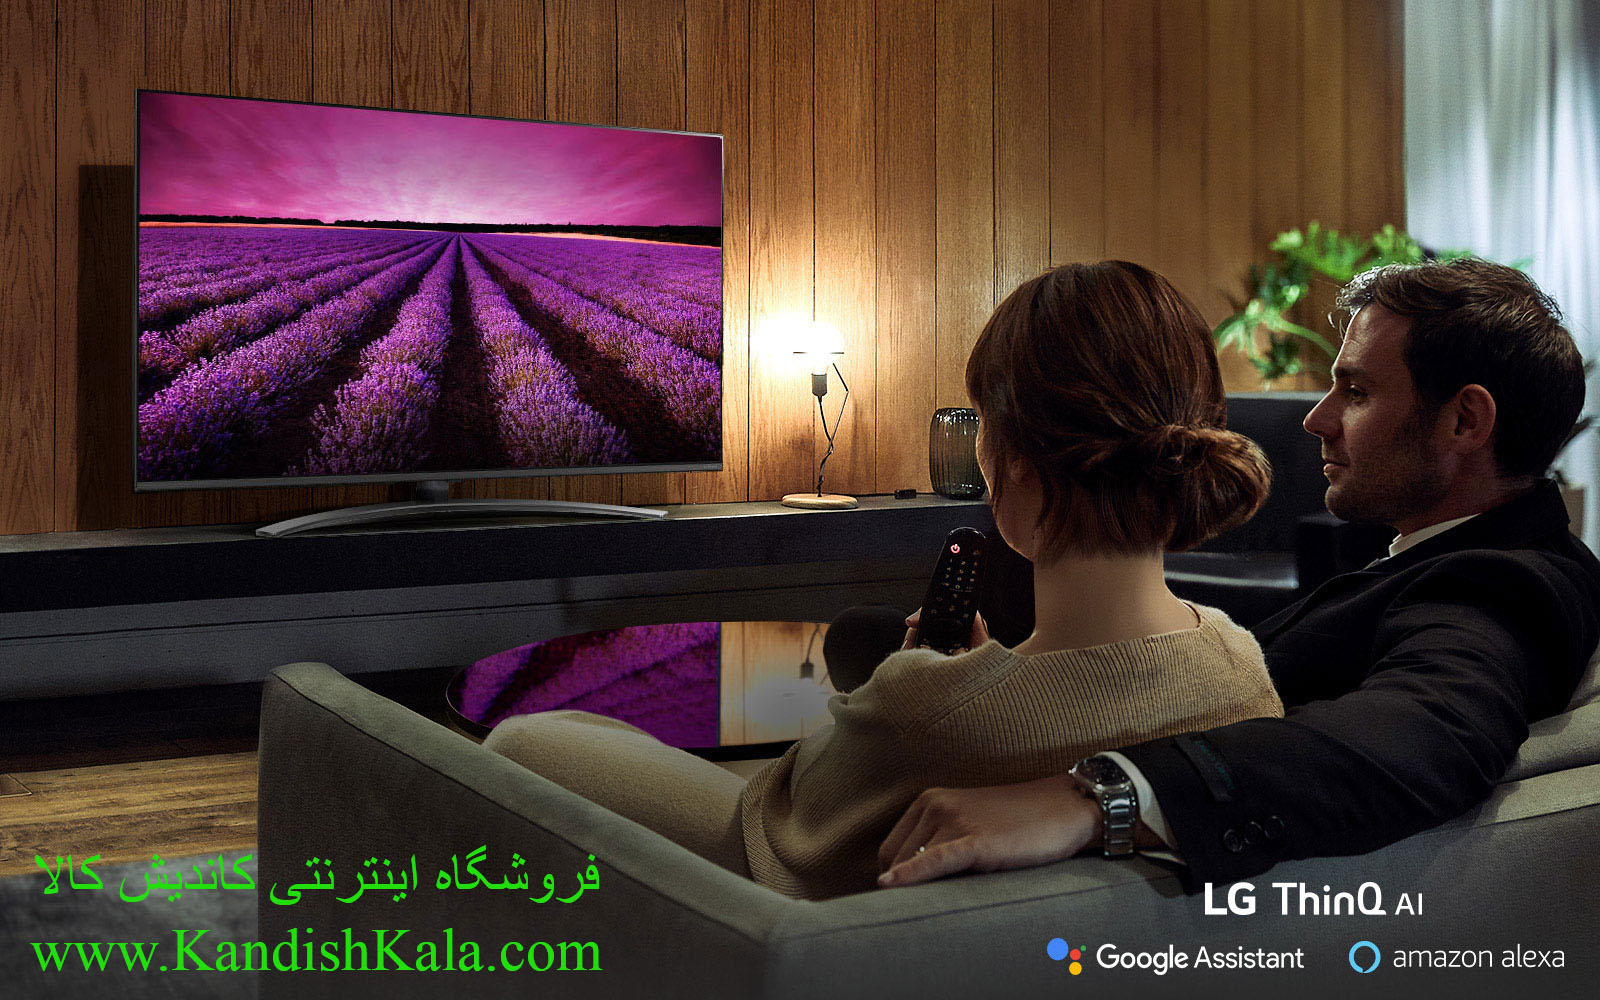 قیمت تلویزیون 65 اینچ ال جی مدل 65SM8600